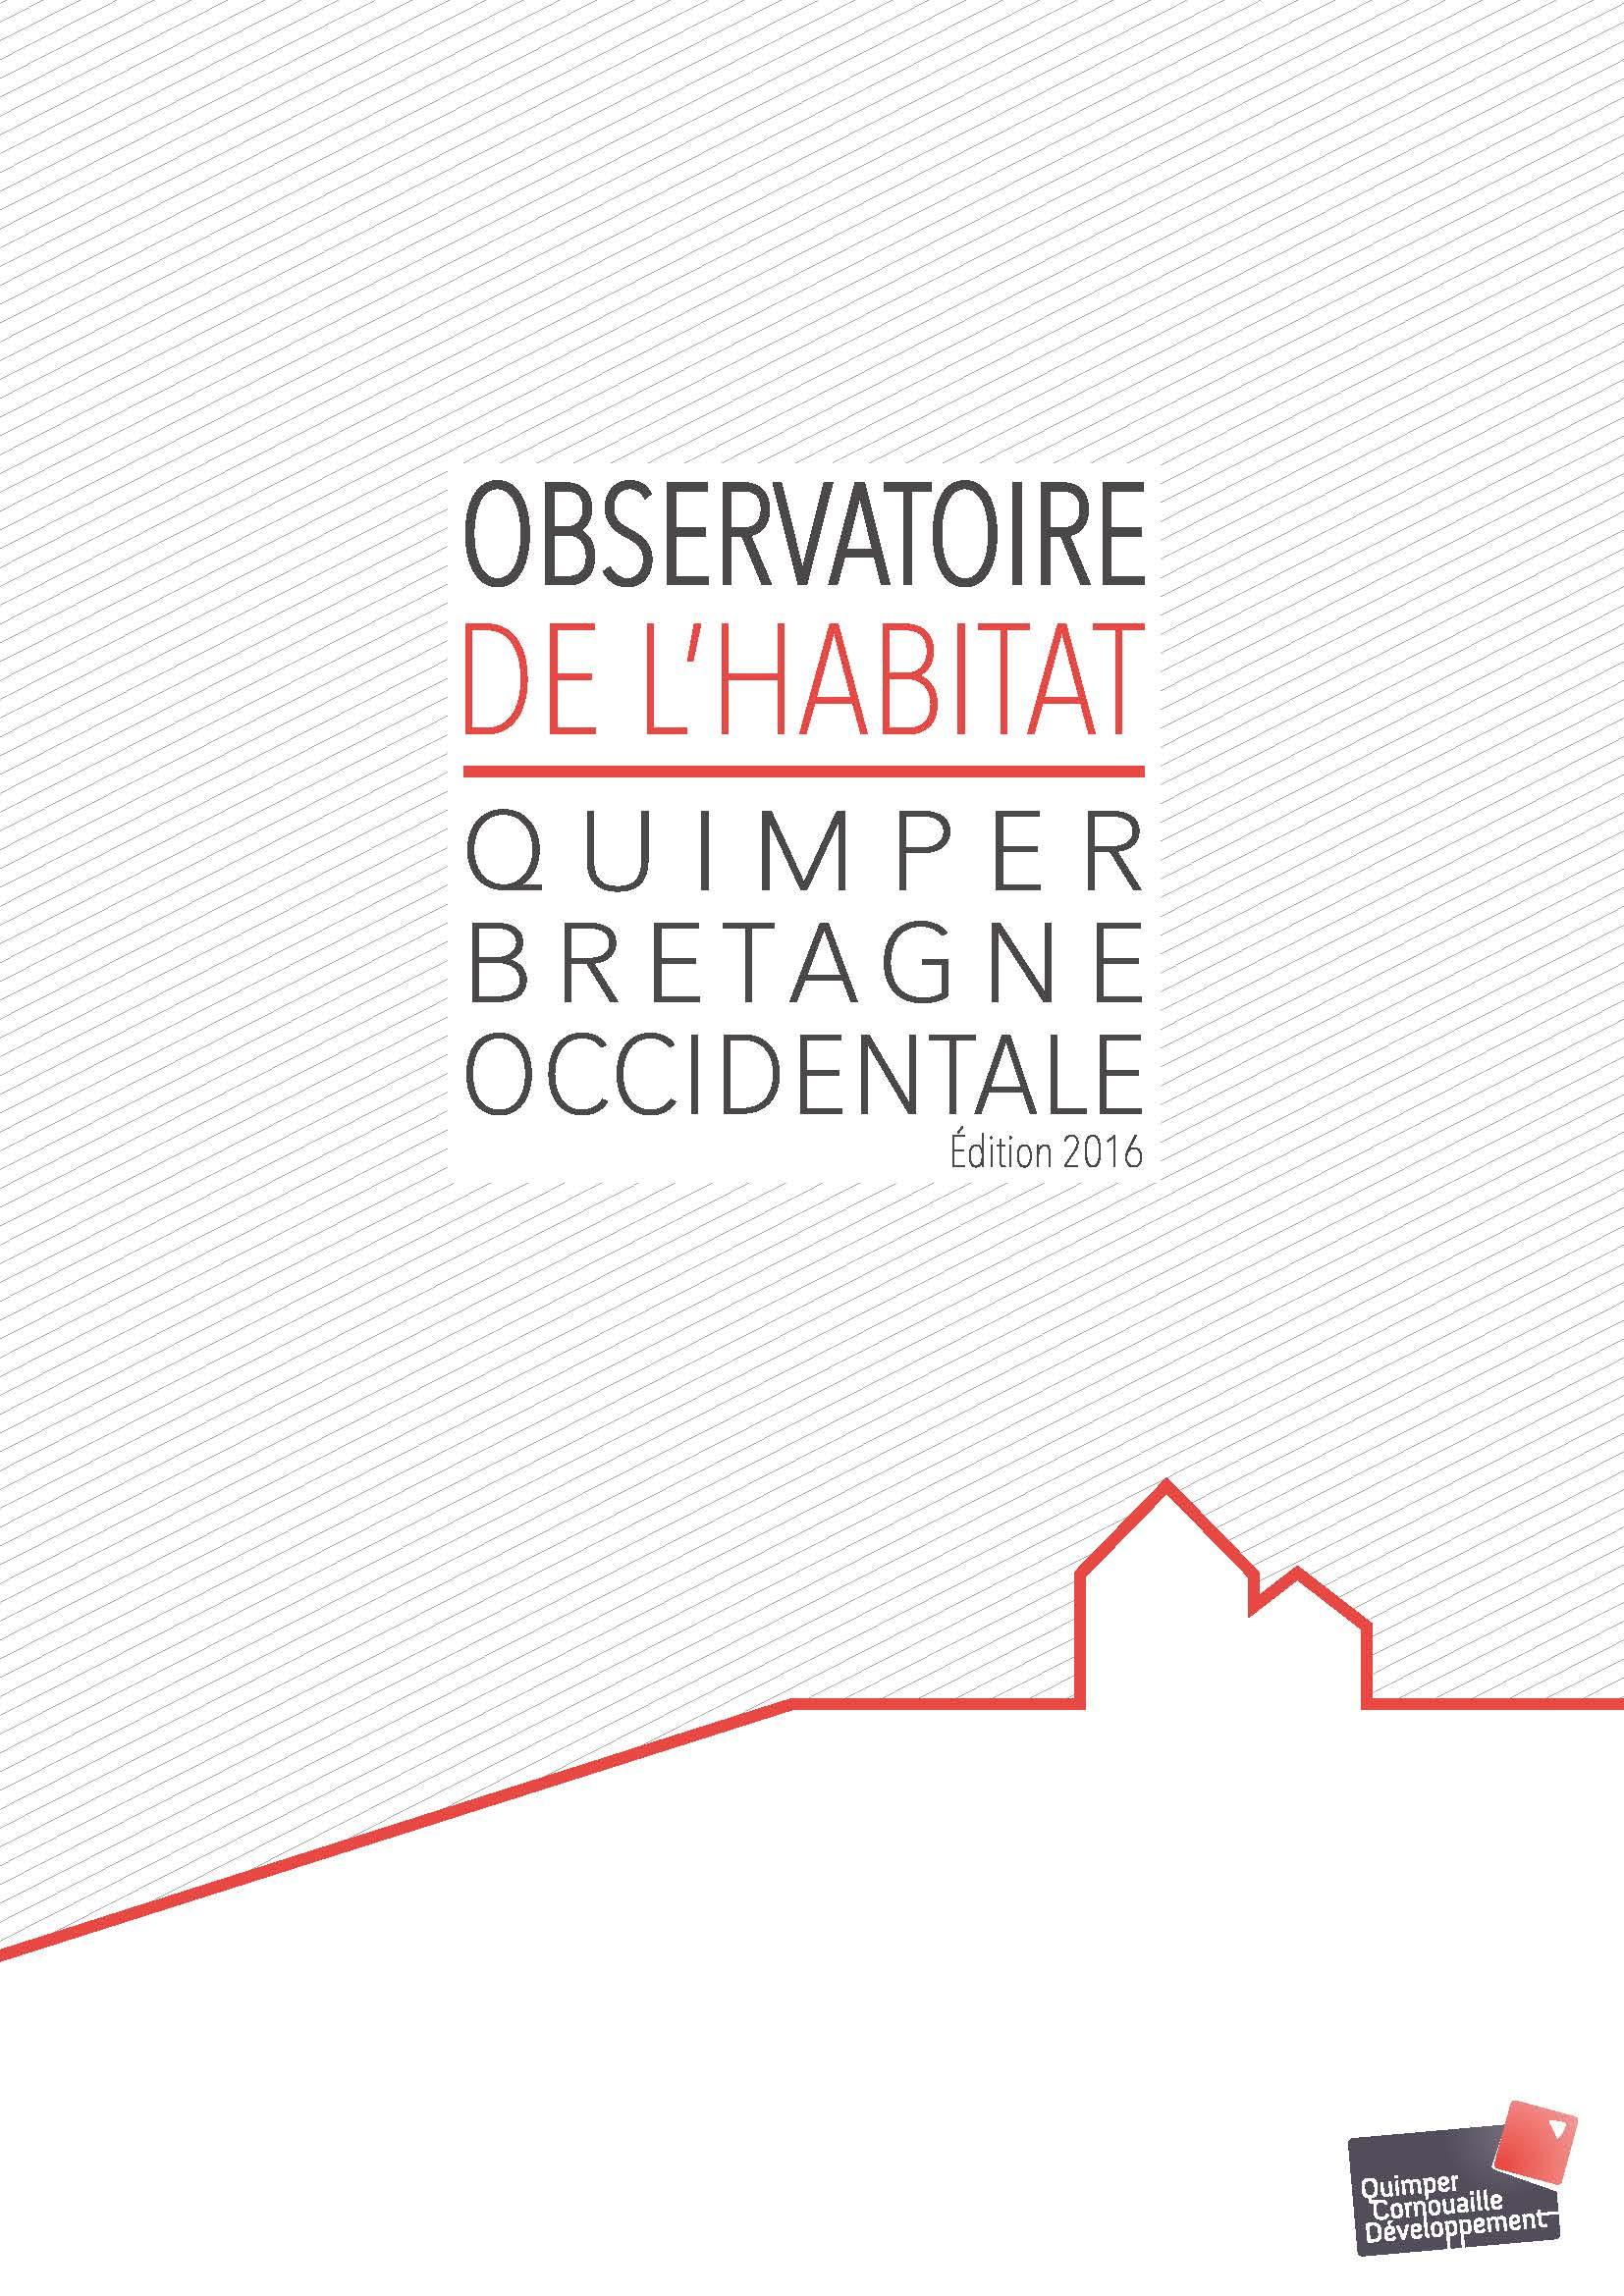 Observatoire de l'habitat 2016 - Quimper Bretagne Occidentale (avril 2017)